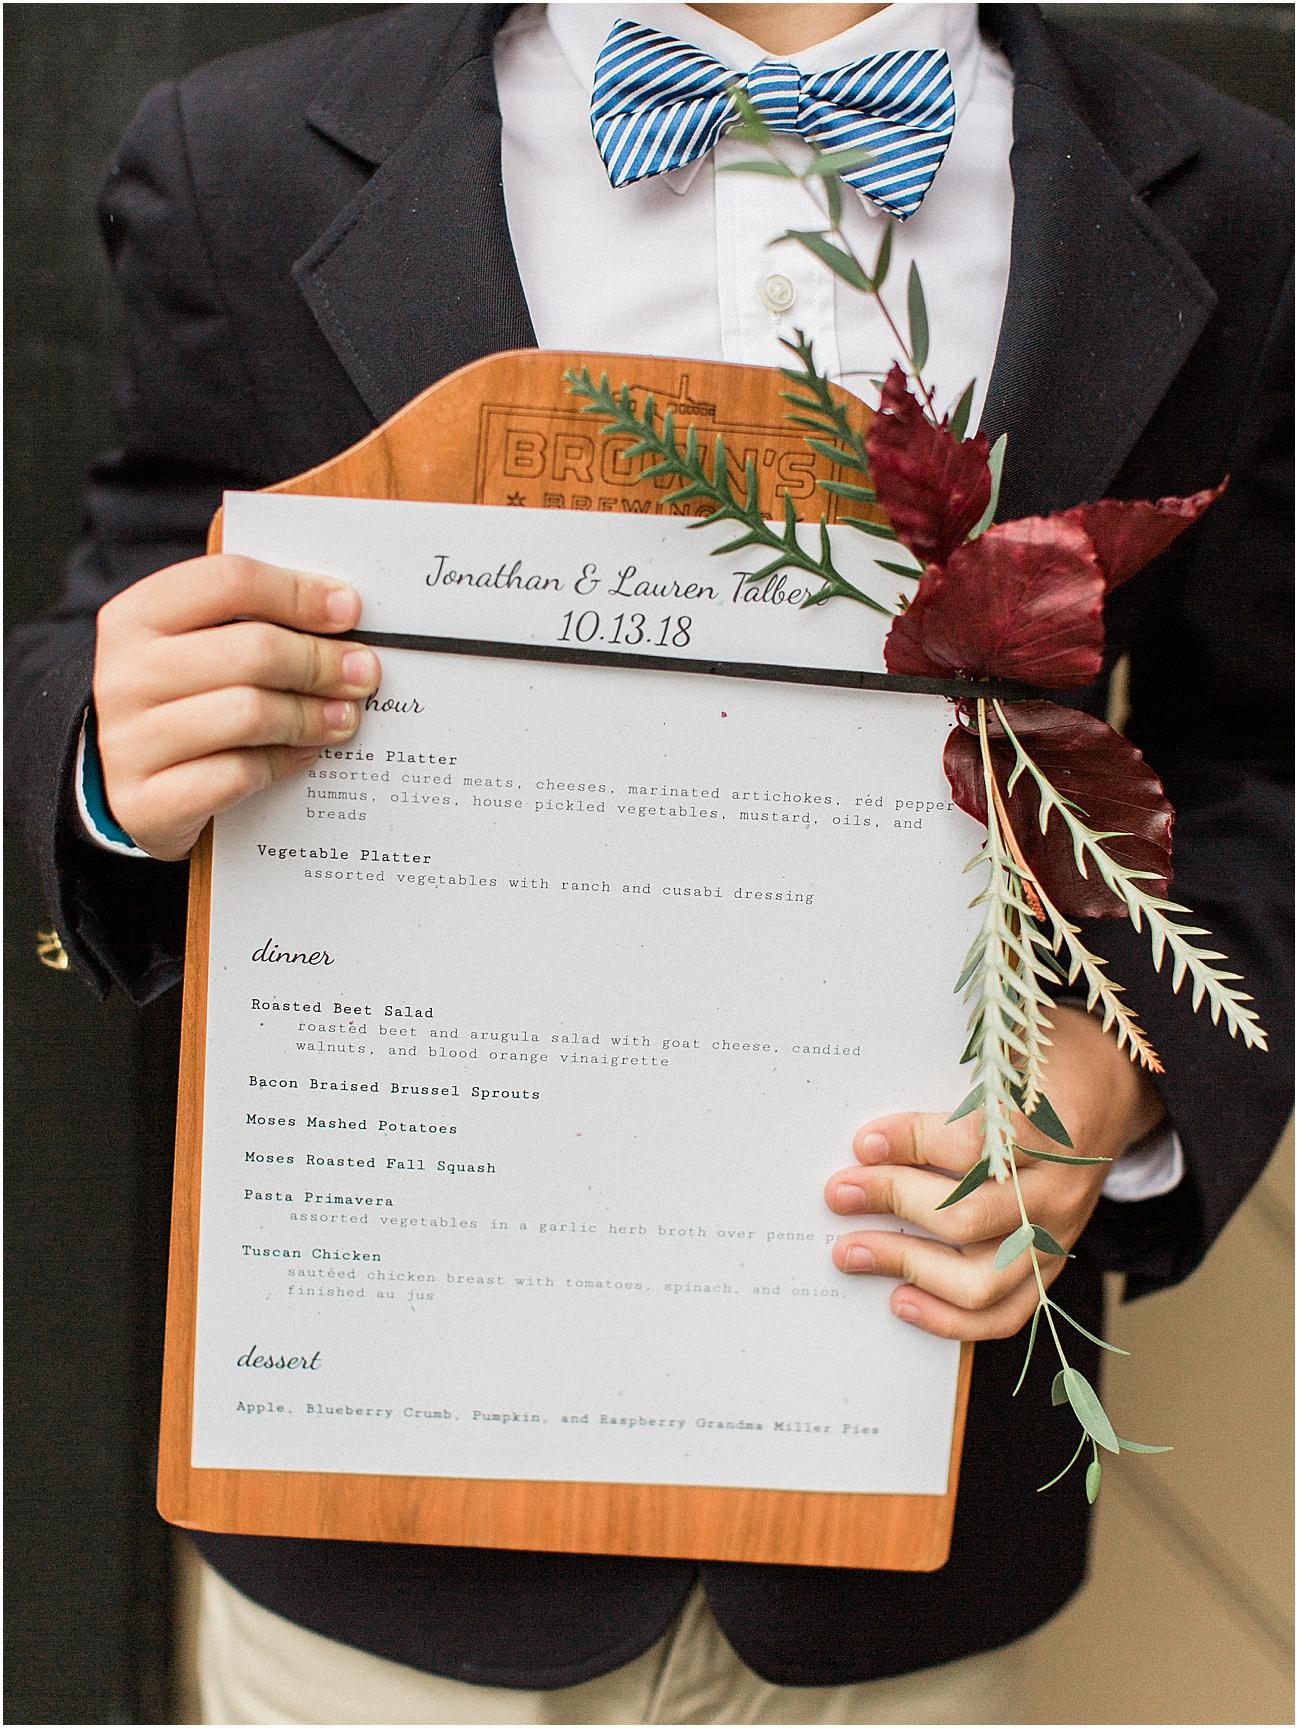 lauren_john_jon_ablany_browns_brewery_moses_farm_fall_cape_cod_boston_wedding_photographer_meredith_jane_photography_photo_1503.jpg